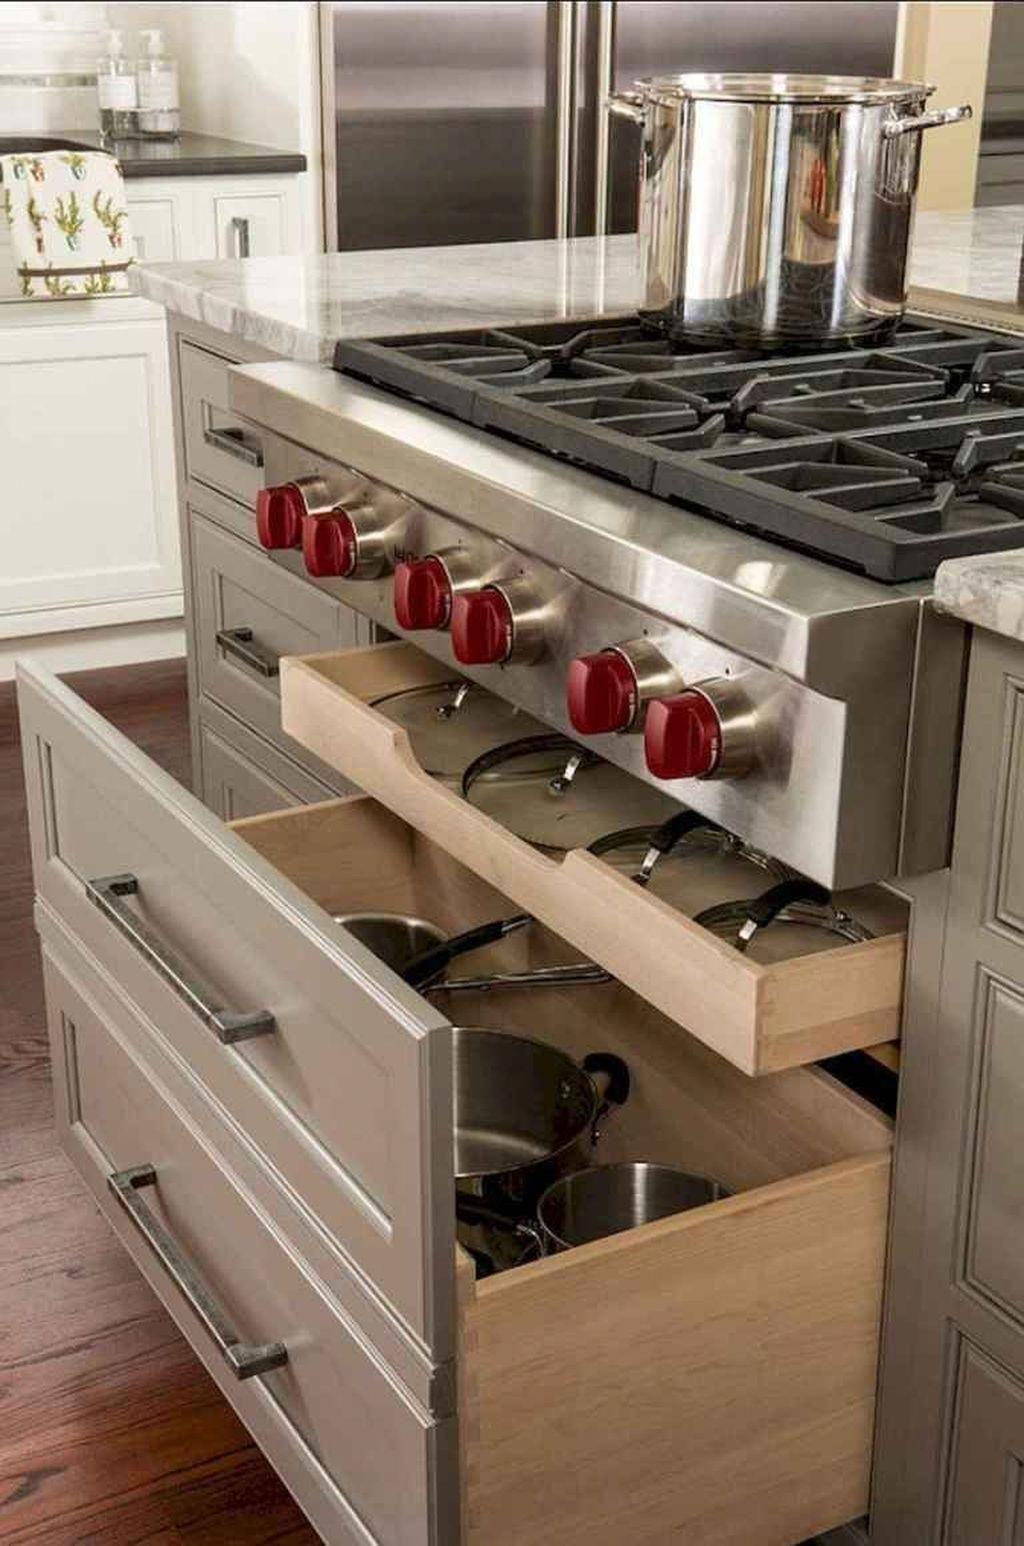 10x10 Kitchen Remodel: Have A Peek Below For 10x10 Kitchen Remodel